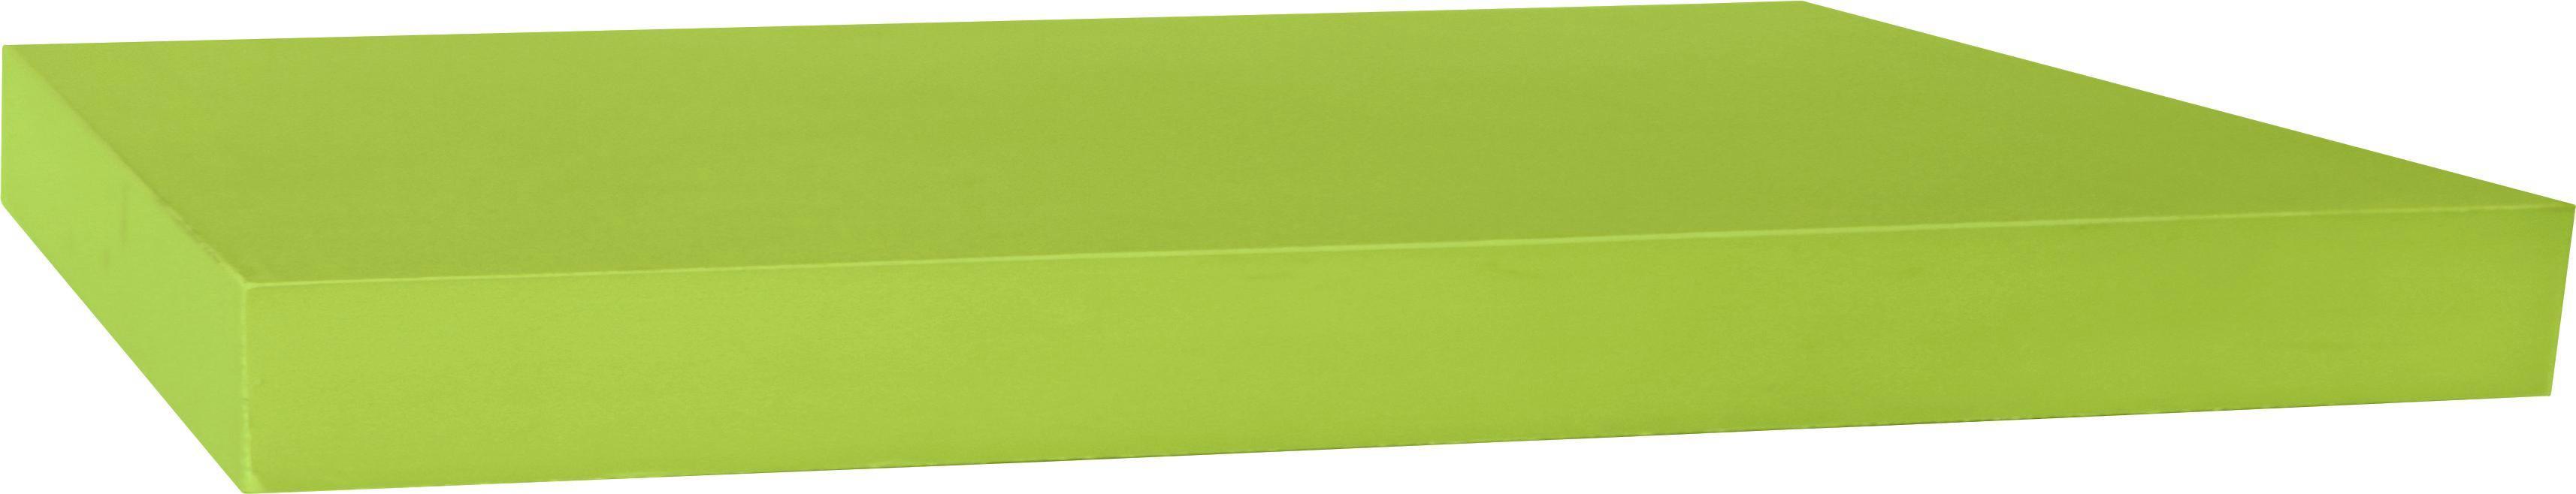 Falipolc Simple - zöld, modern, műanyag/faanyagok (80/3,8/23,5cm)